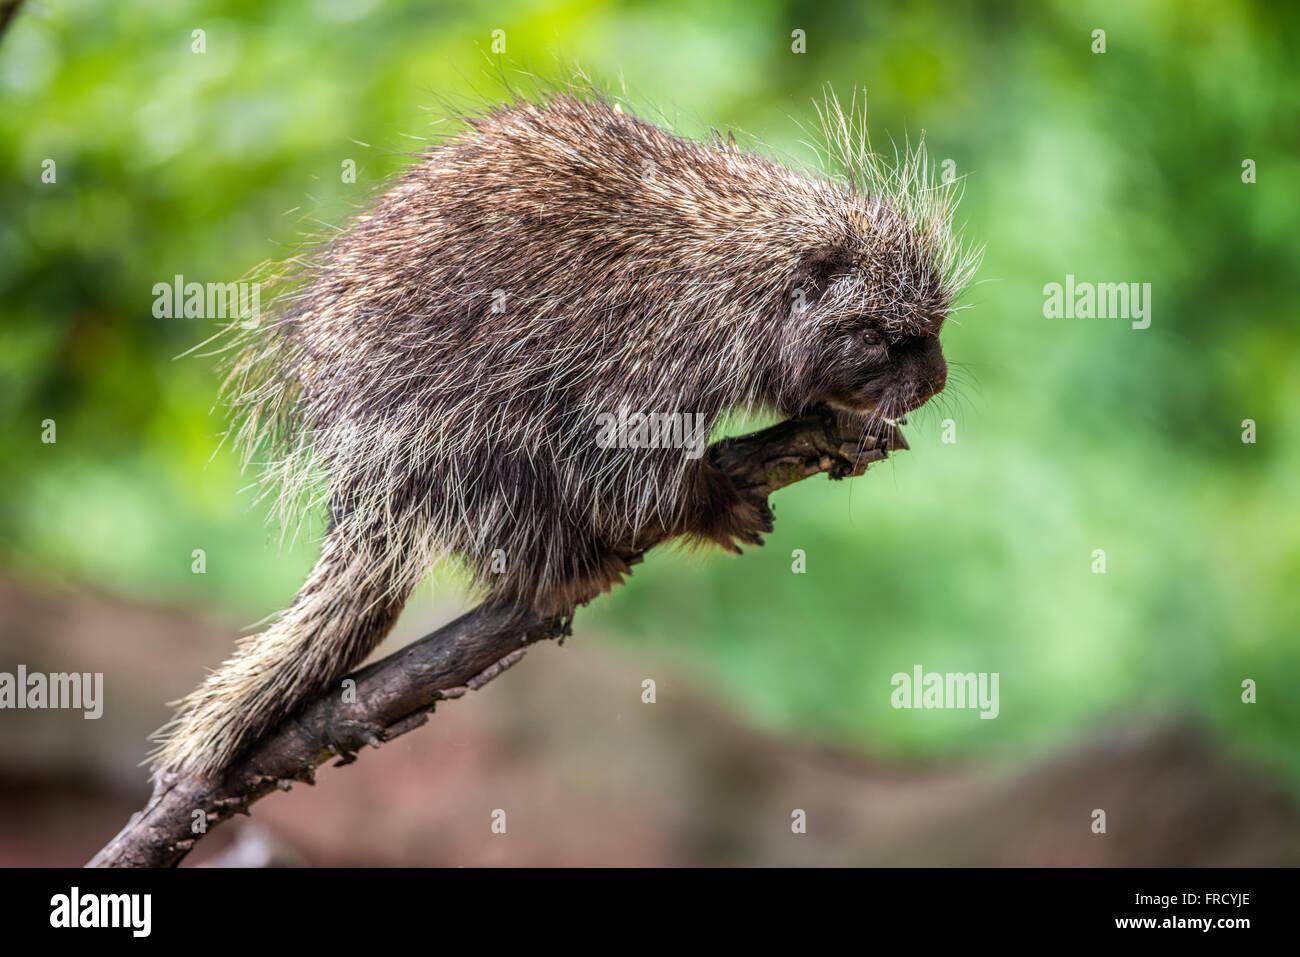 North American porcupine (Erethizon dorsatum) walks on a branch Stock Photo